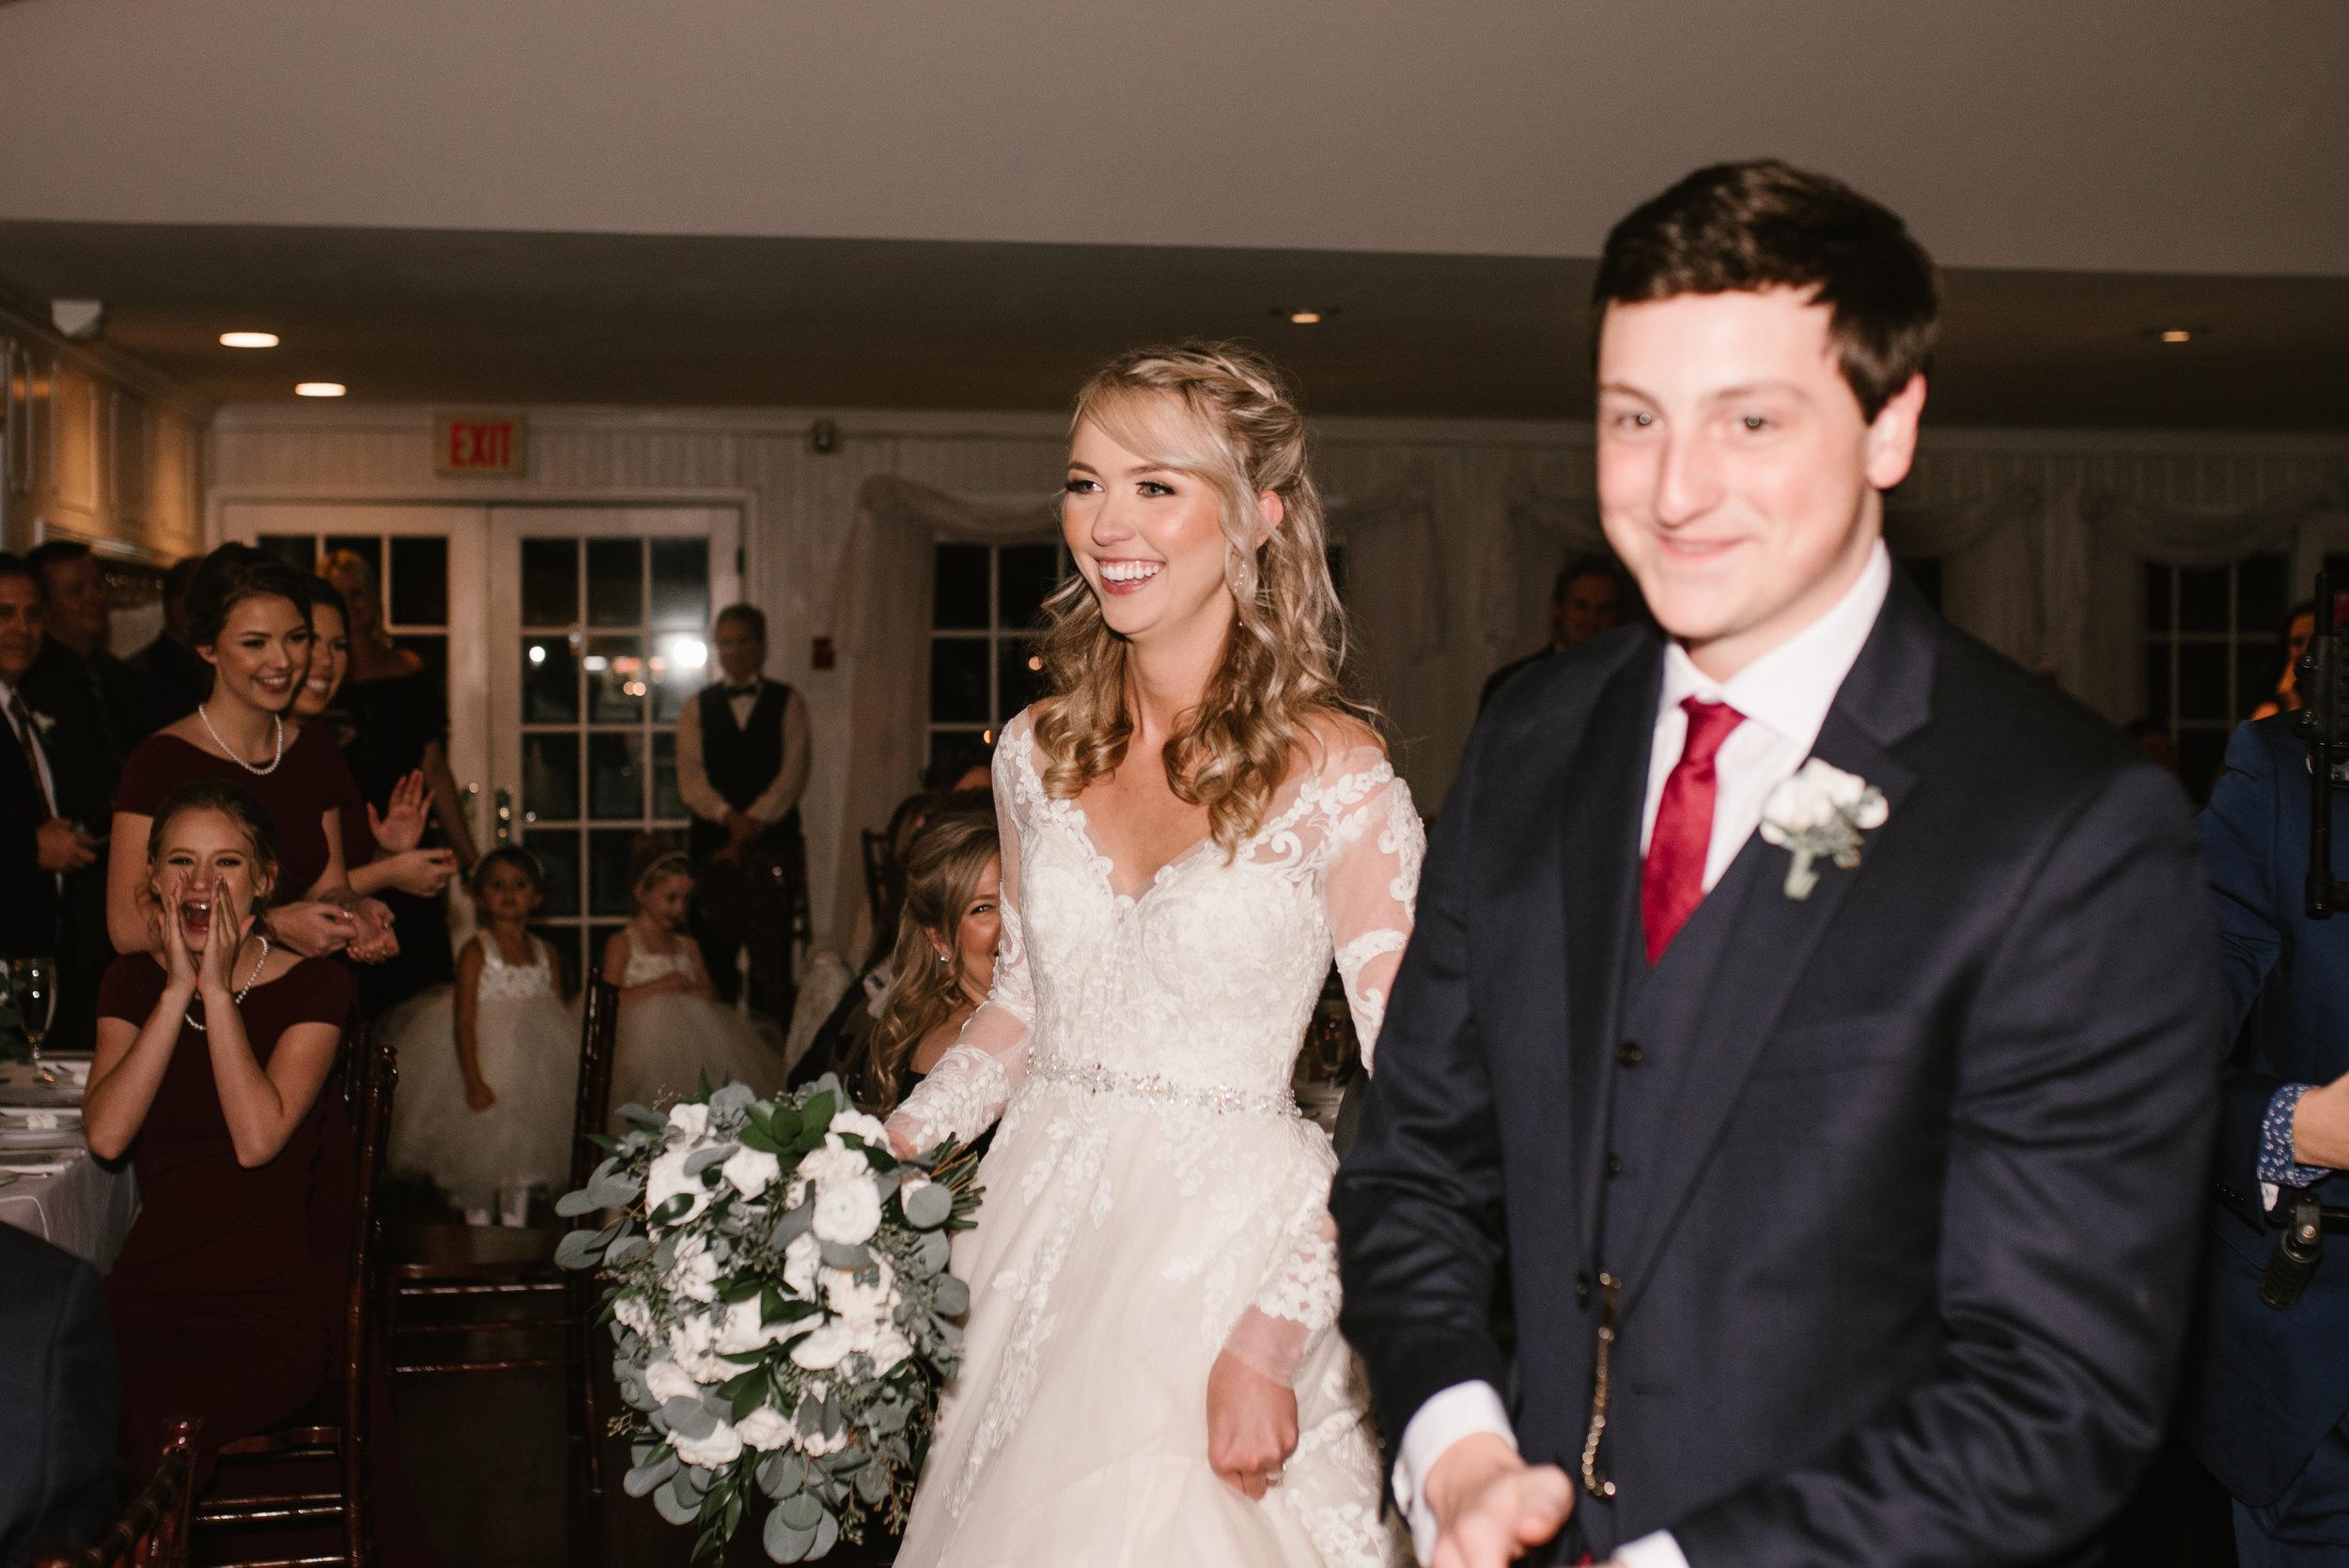 antrim-18444-spencer-wedding-1468.jpg